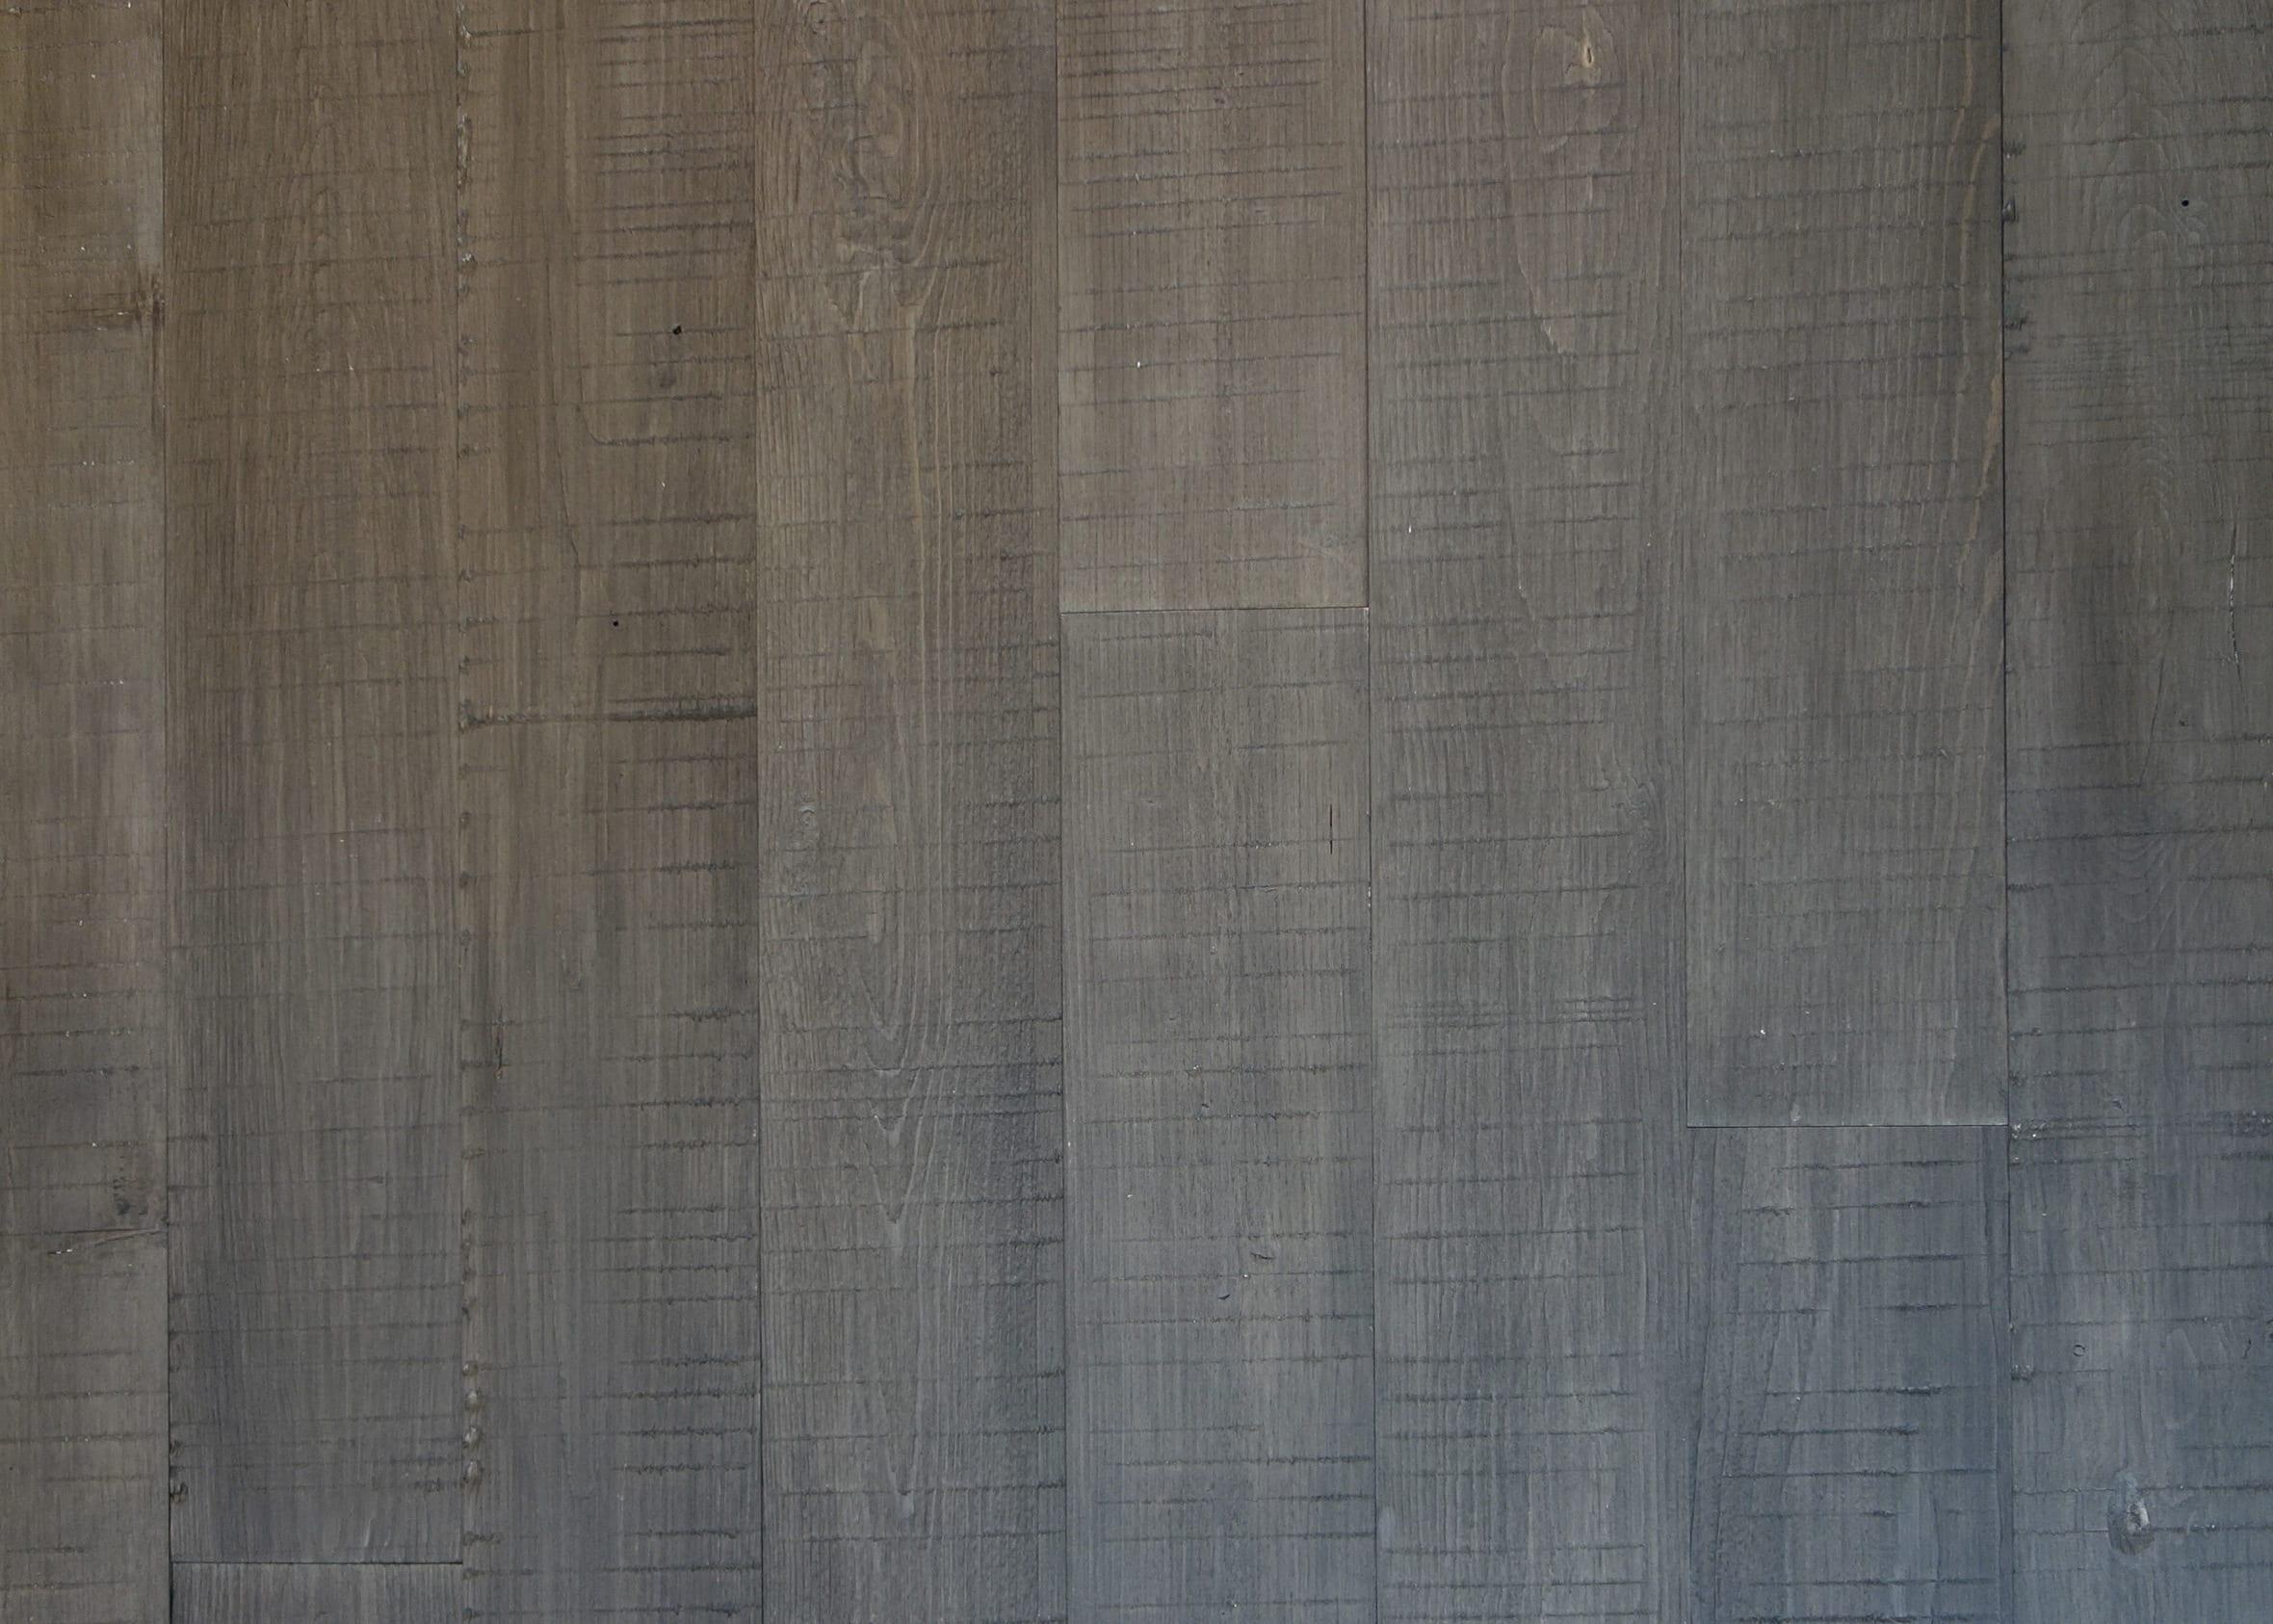 peel and stick wood wall panels